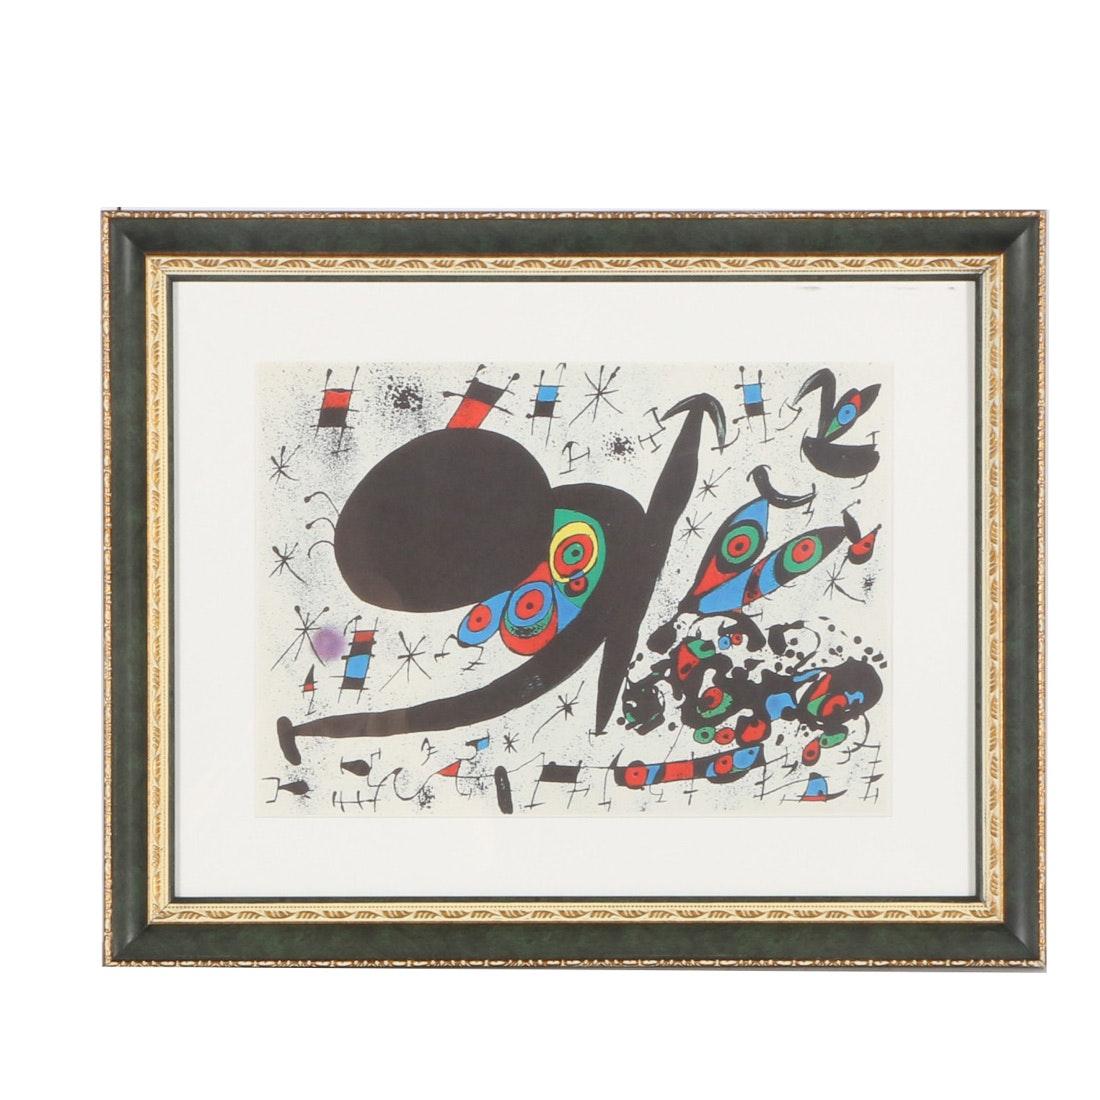 "Joan Miro Lithograph ""Homenatge a Joan Prats"""